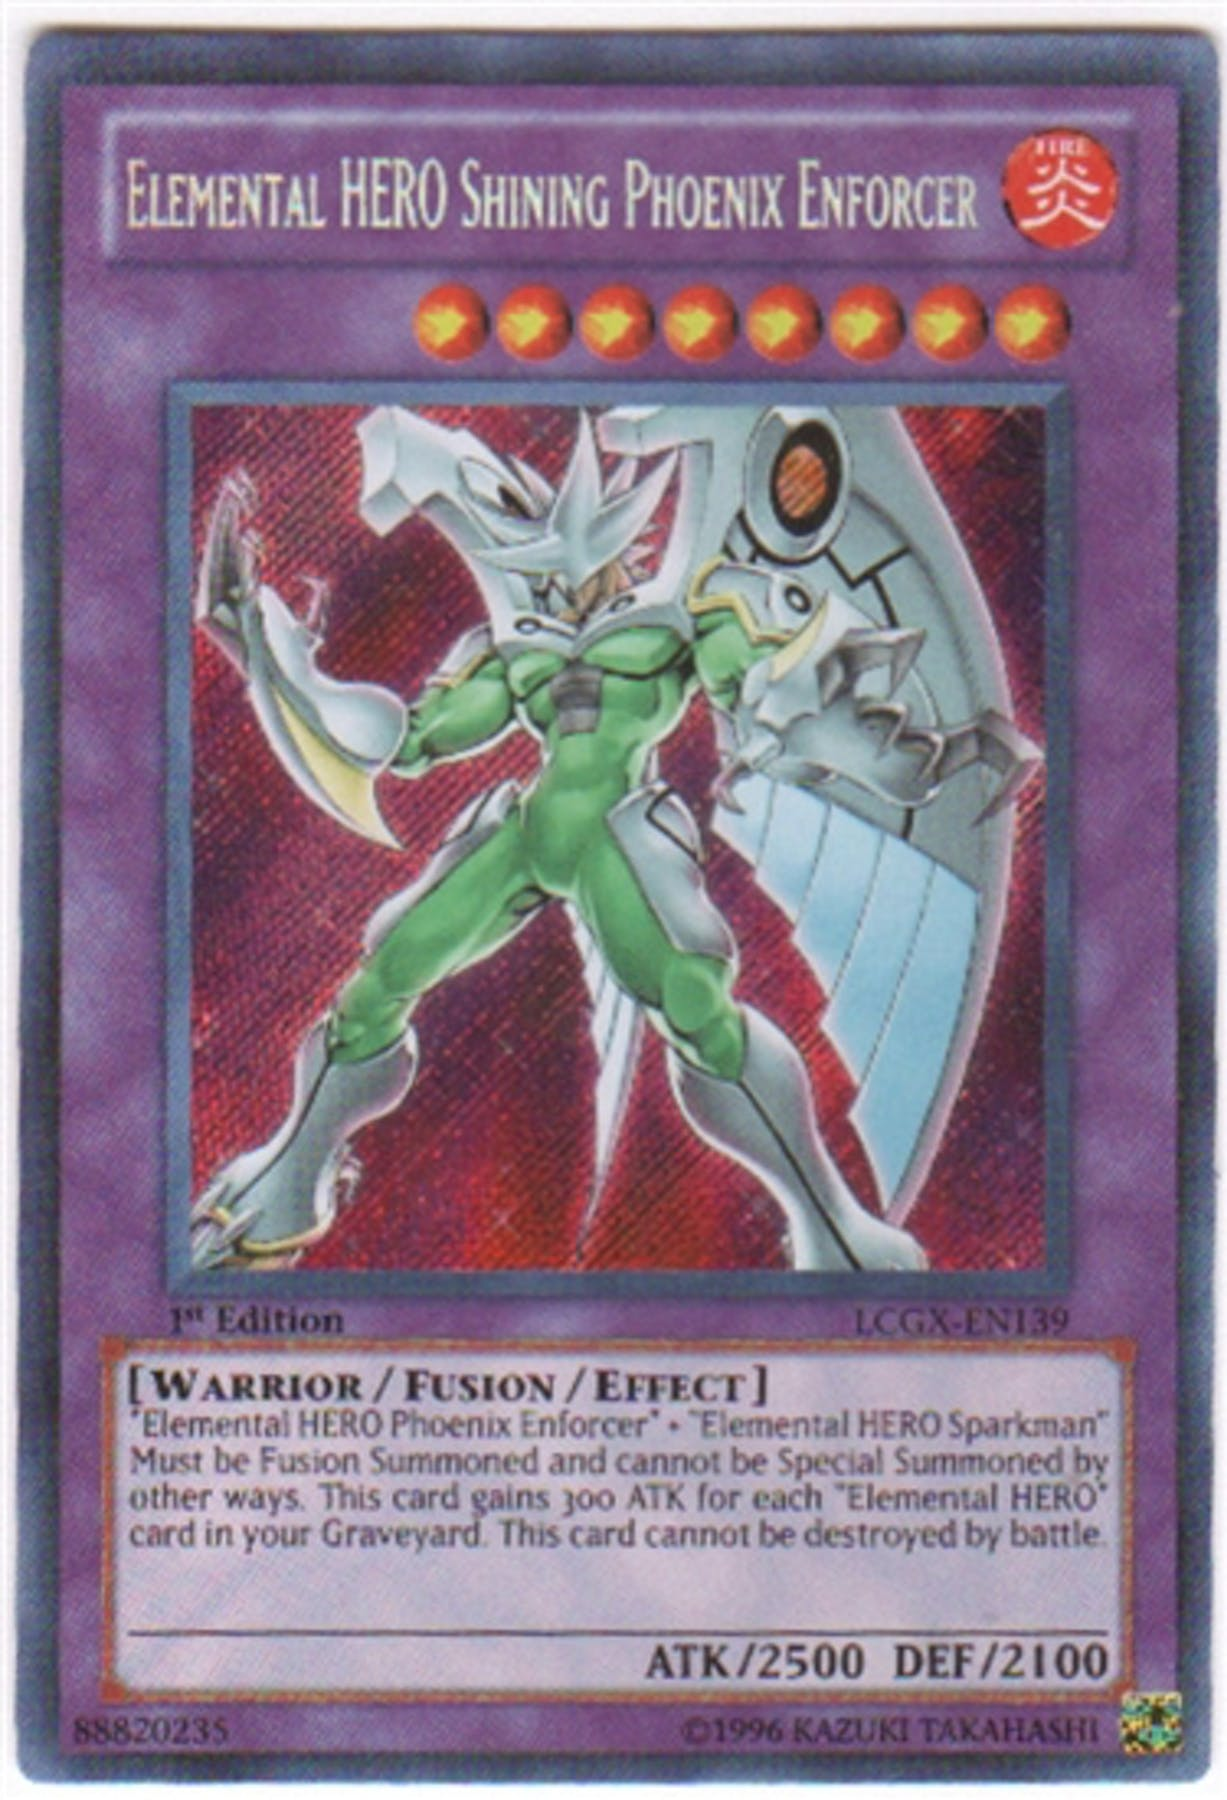 yugioh phoenix enforcer